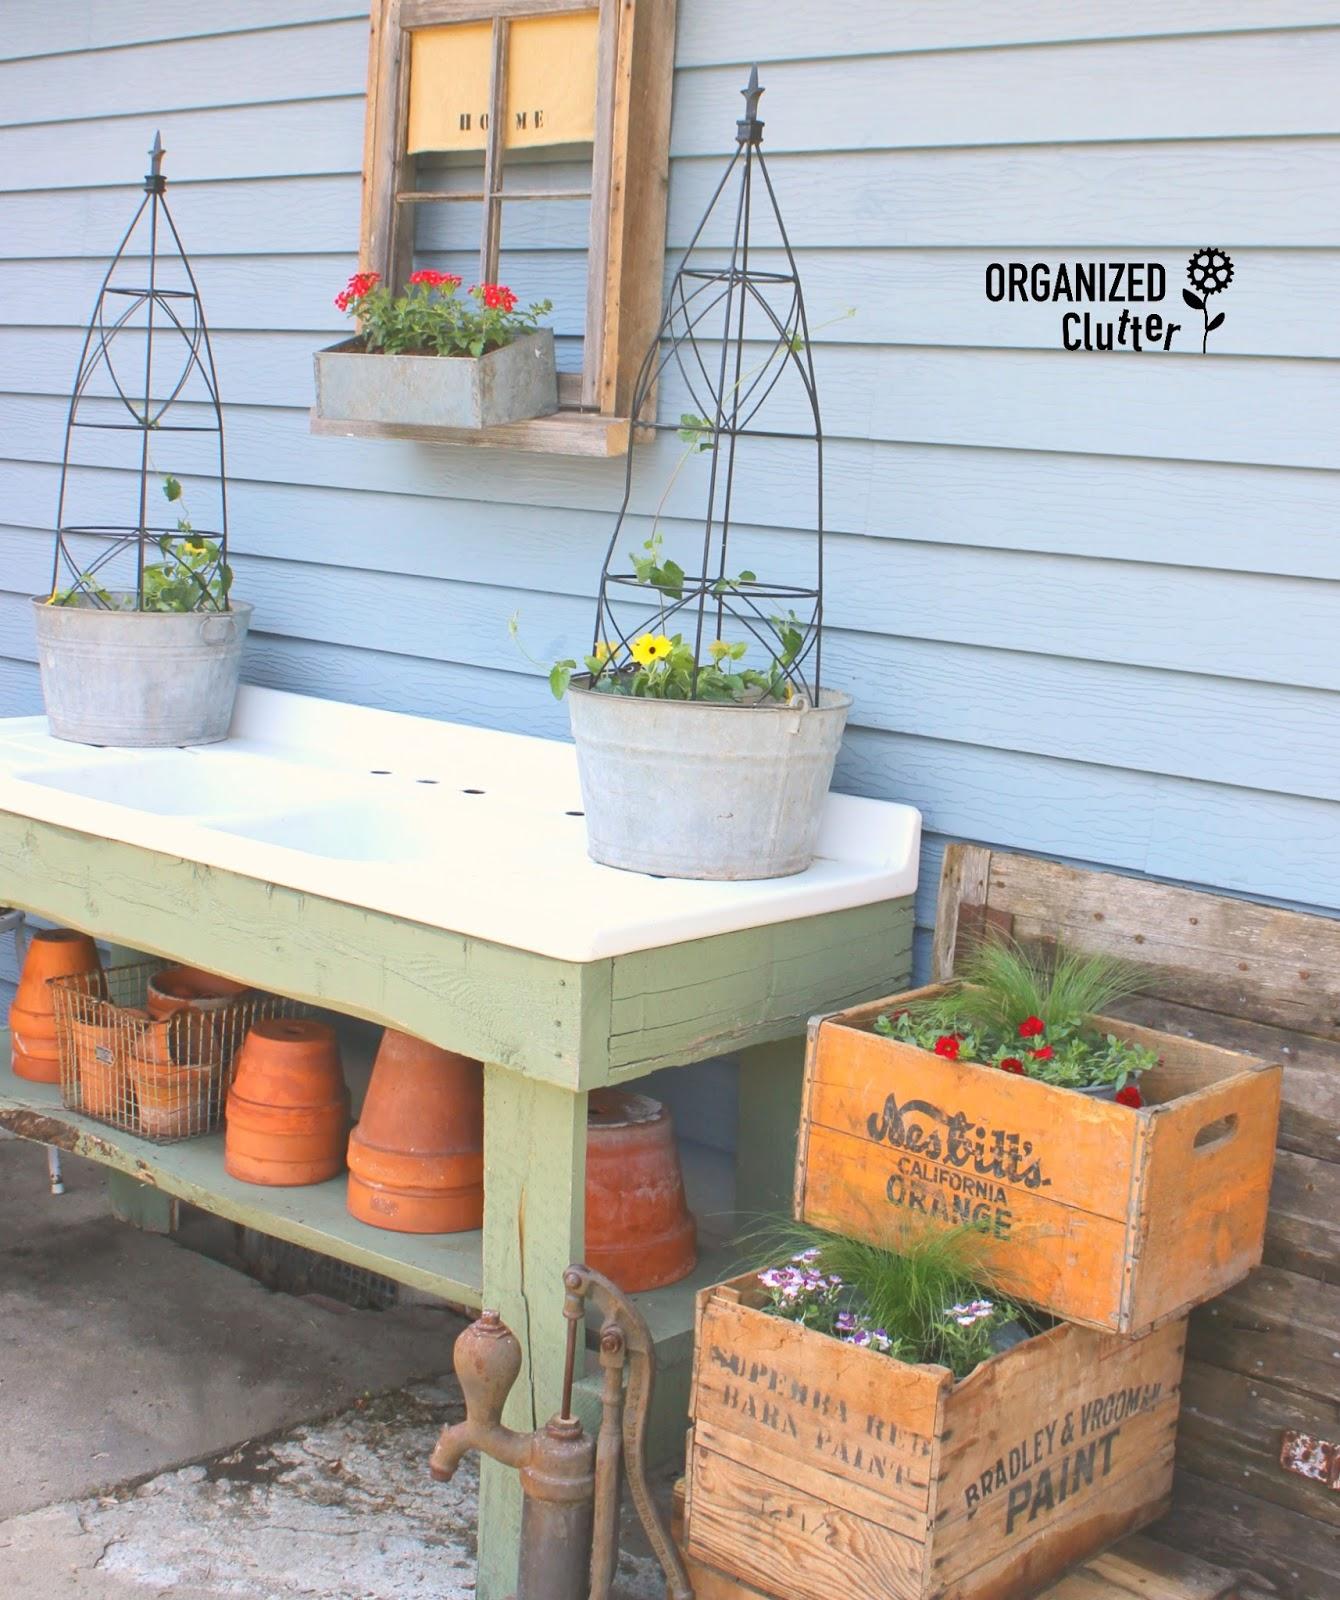 Garage Sale Junk To Awesome Garden Junk Organized Clutter